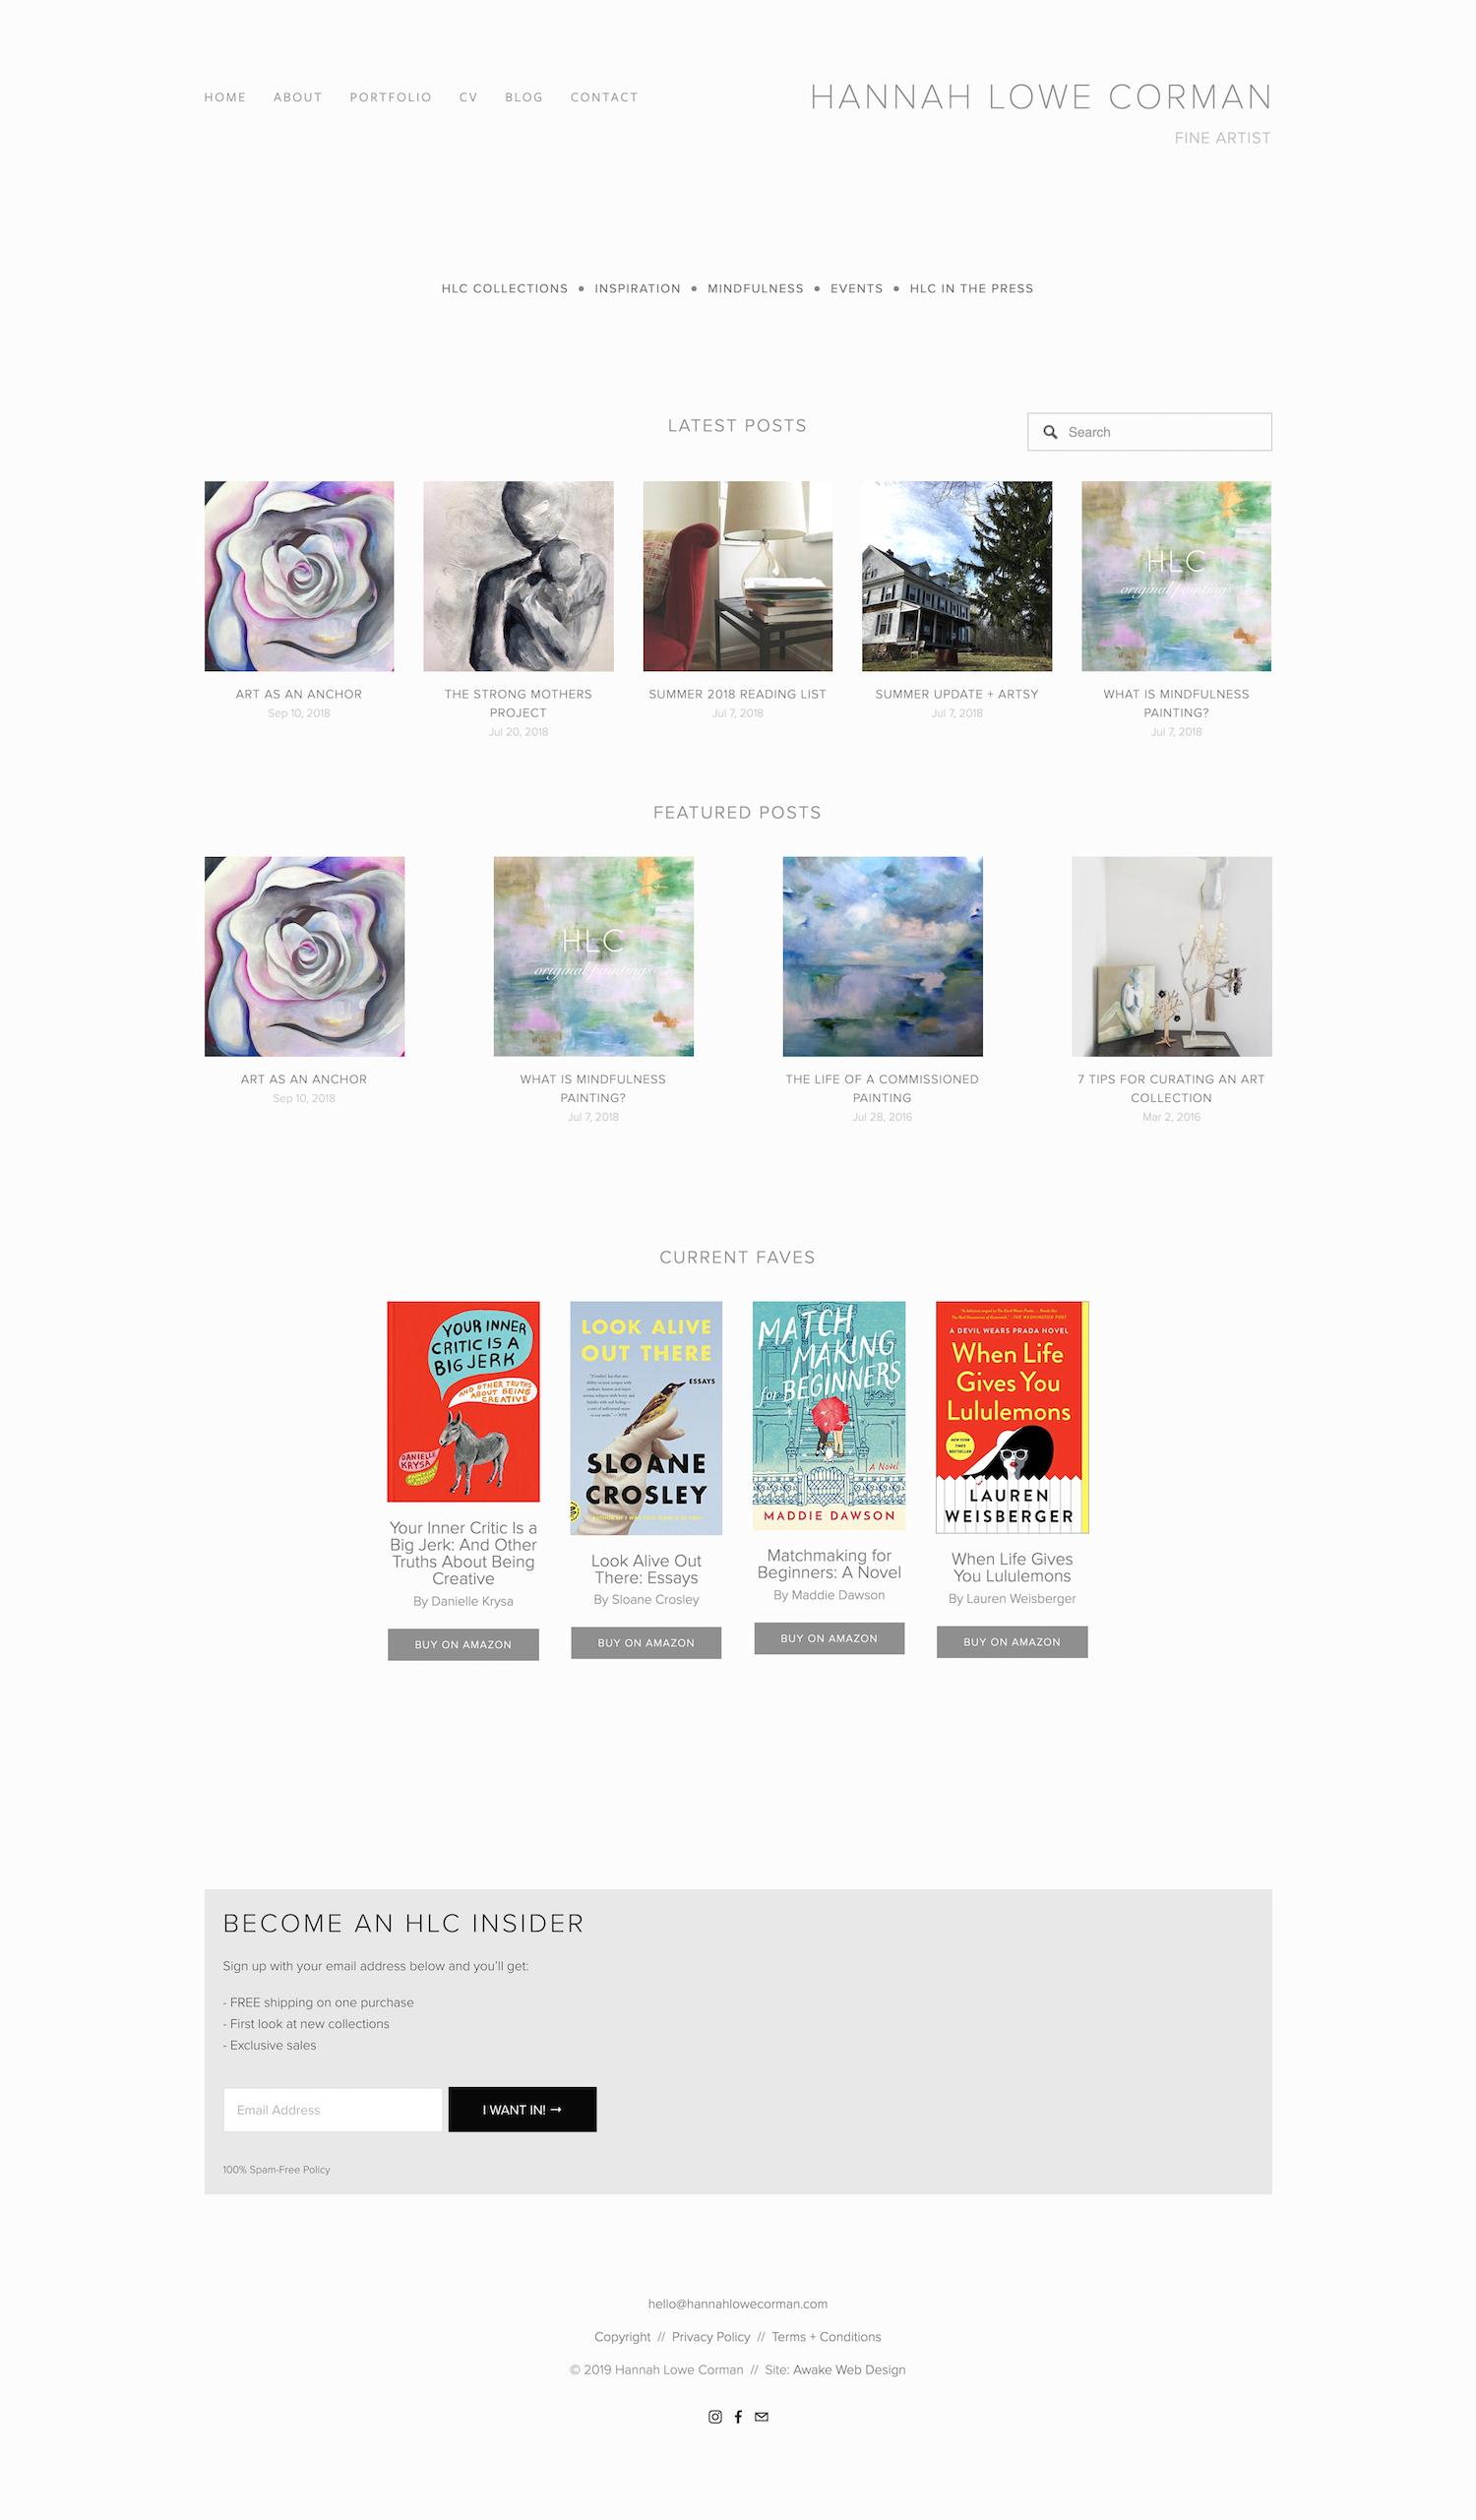 hannah-lowe-corman-awake-web-design-portfolio-7.jpg